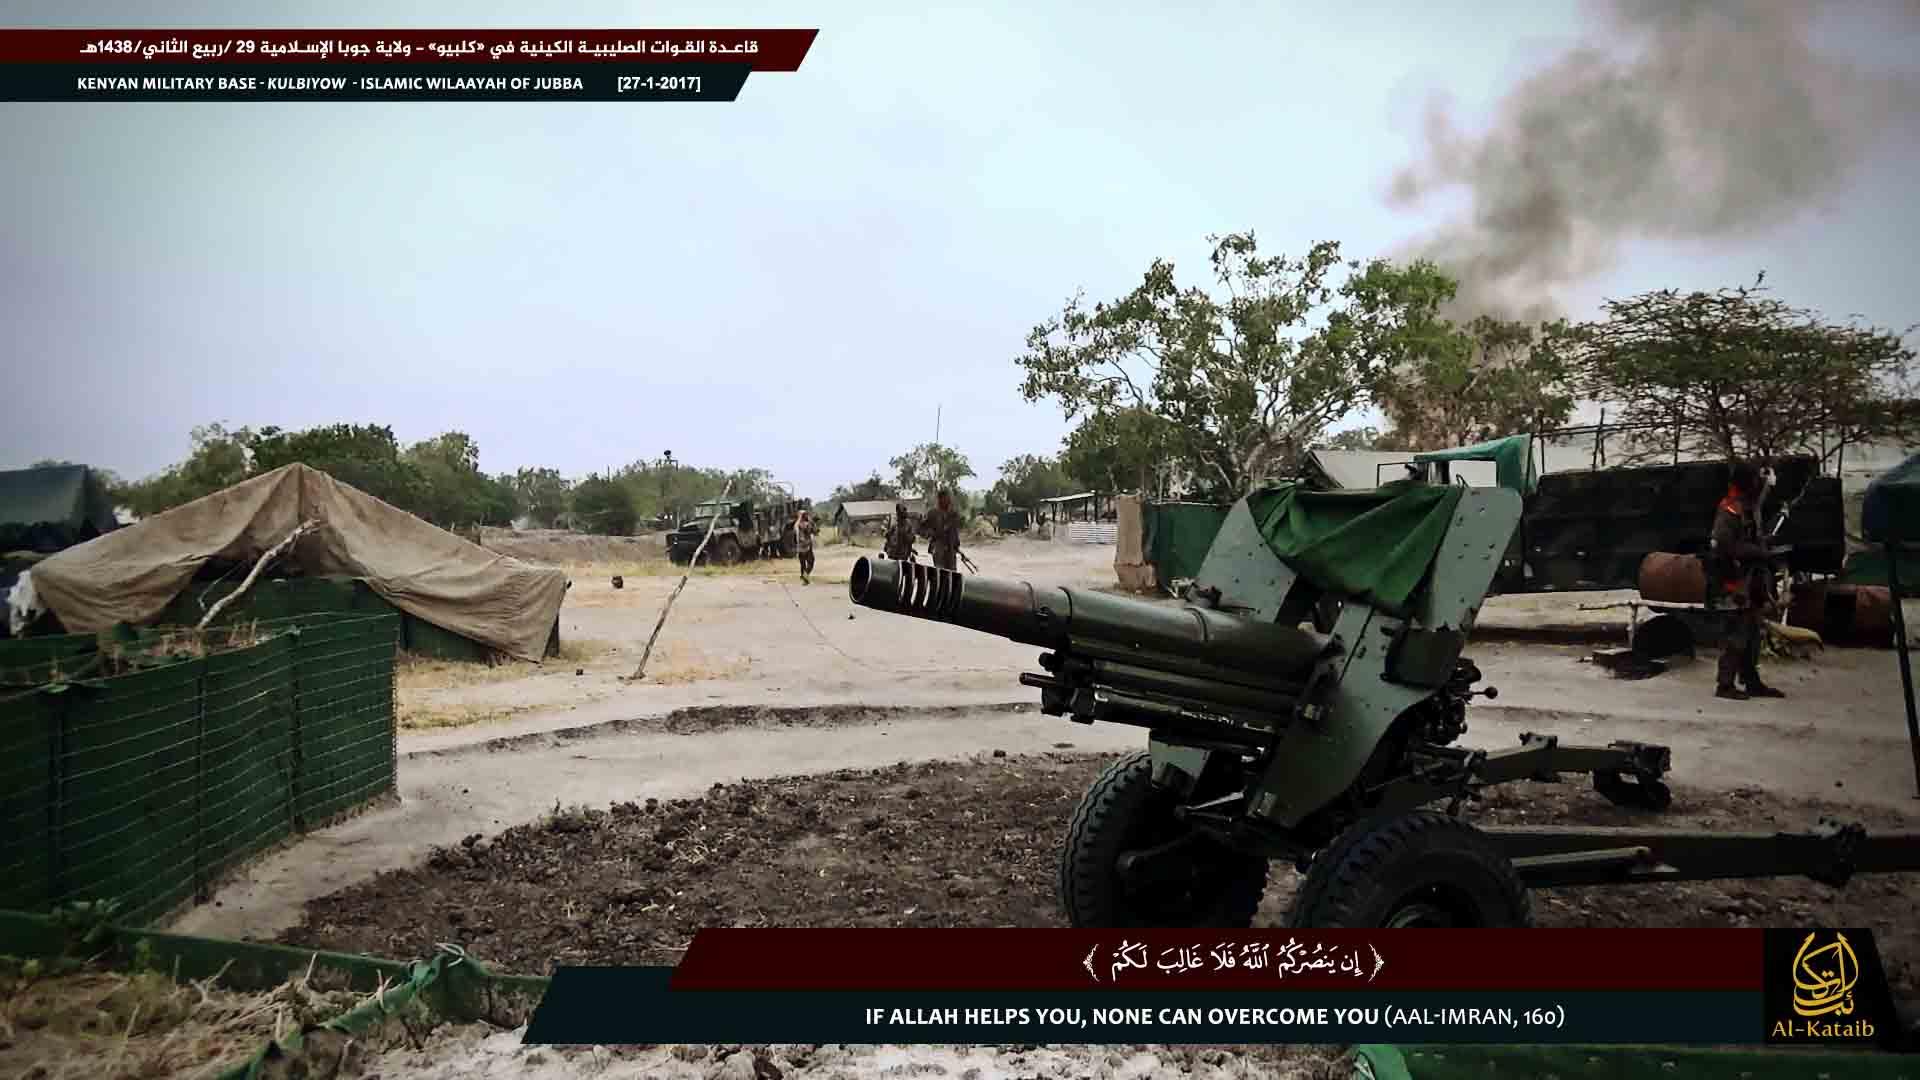 Al Shabaab Militants Capture Kenyan Military Camp in Somalia: 72 Kenyan Soldiers Killed (Photos)